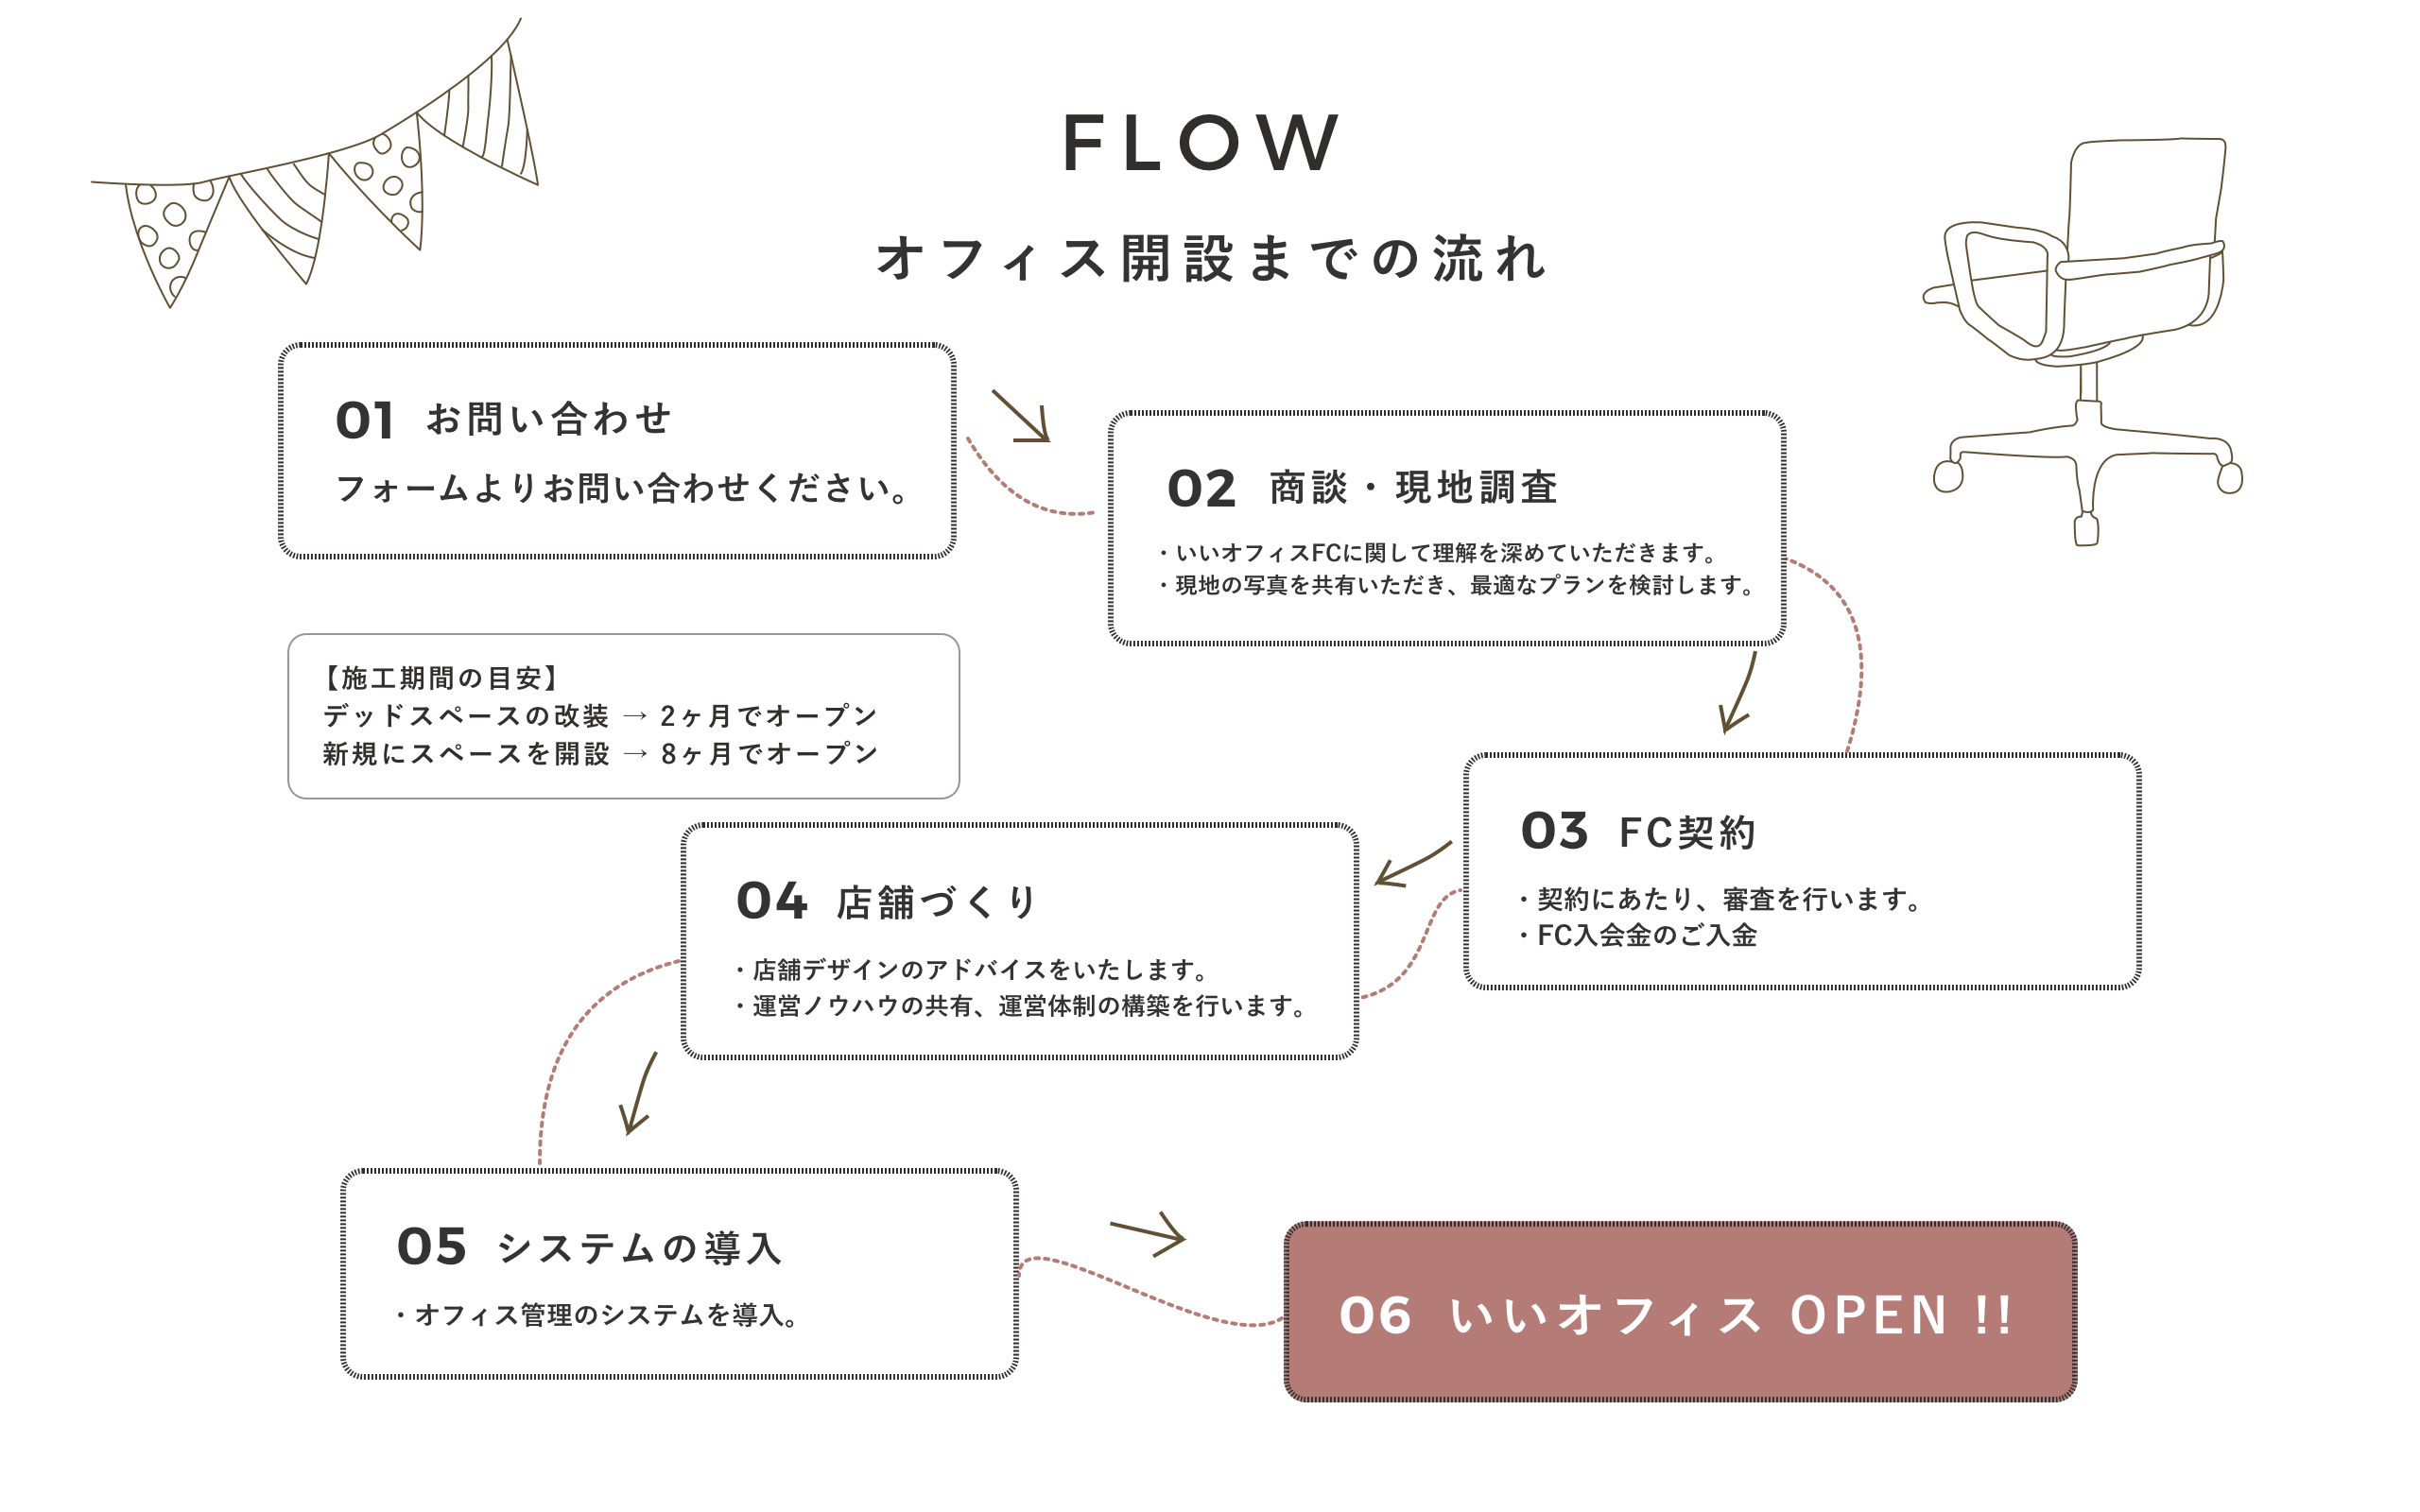 FLOW オフィス開設までの流れ 「01 お問い合わせ」→「02 商談・現地調査 お問い合わせ」→「03 FC契約」→「04 店舗づくり」→「05 システムの導入」→「06 いいオフィス OPEN !!」